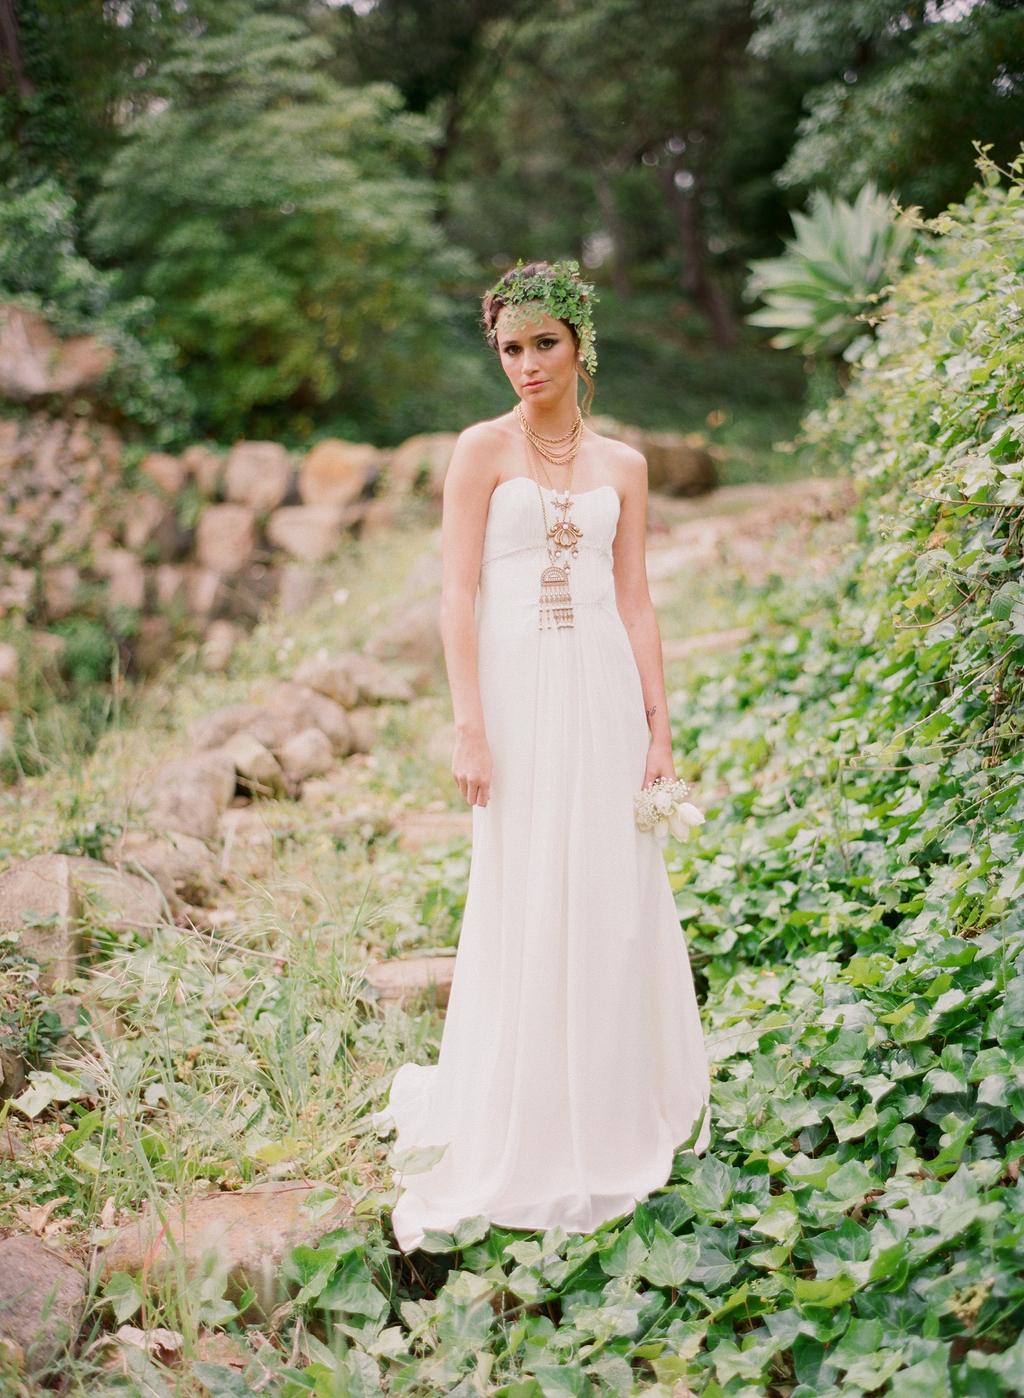 Styled-wedding-santa-barbara-chic-beaux-arts-phtographie-italian-bohemian-wedding-bride-wedding-dress-109.full